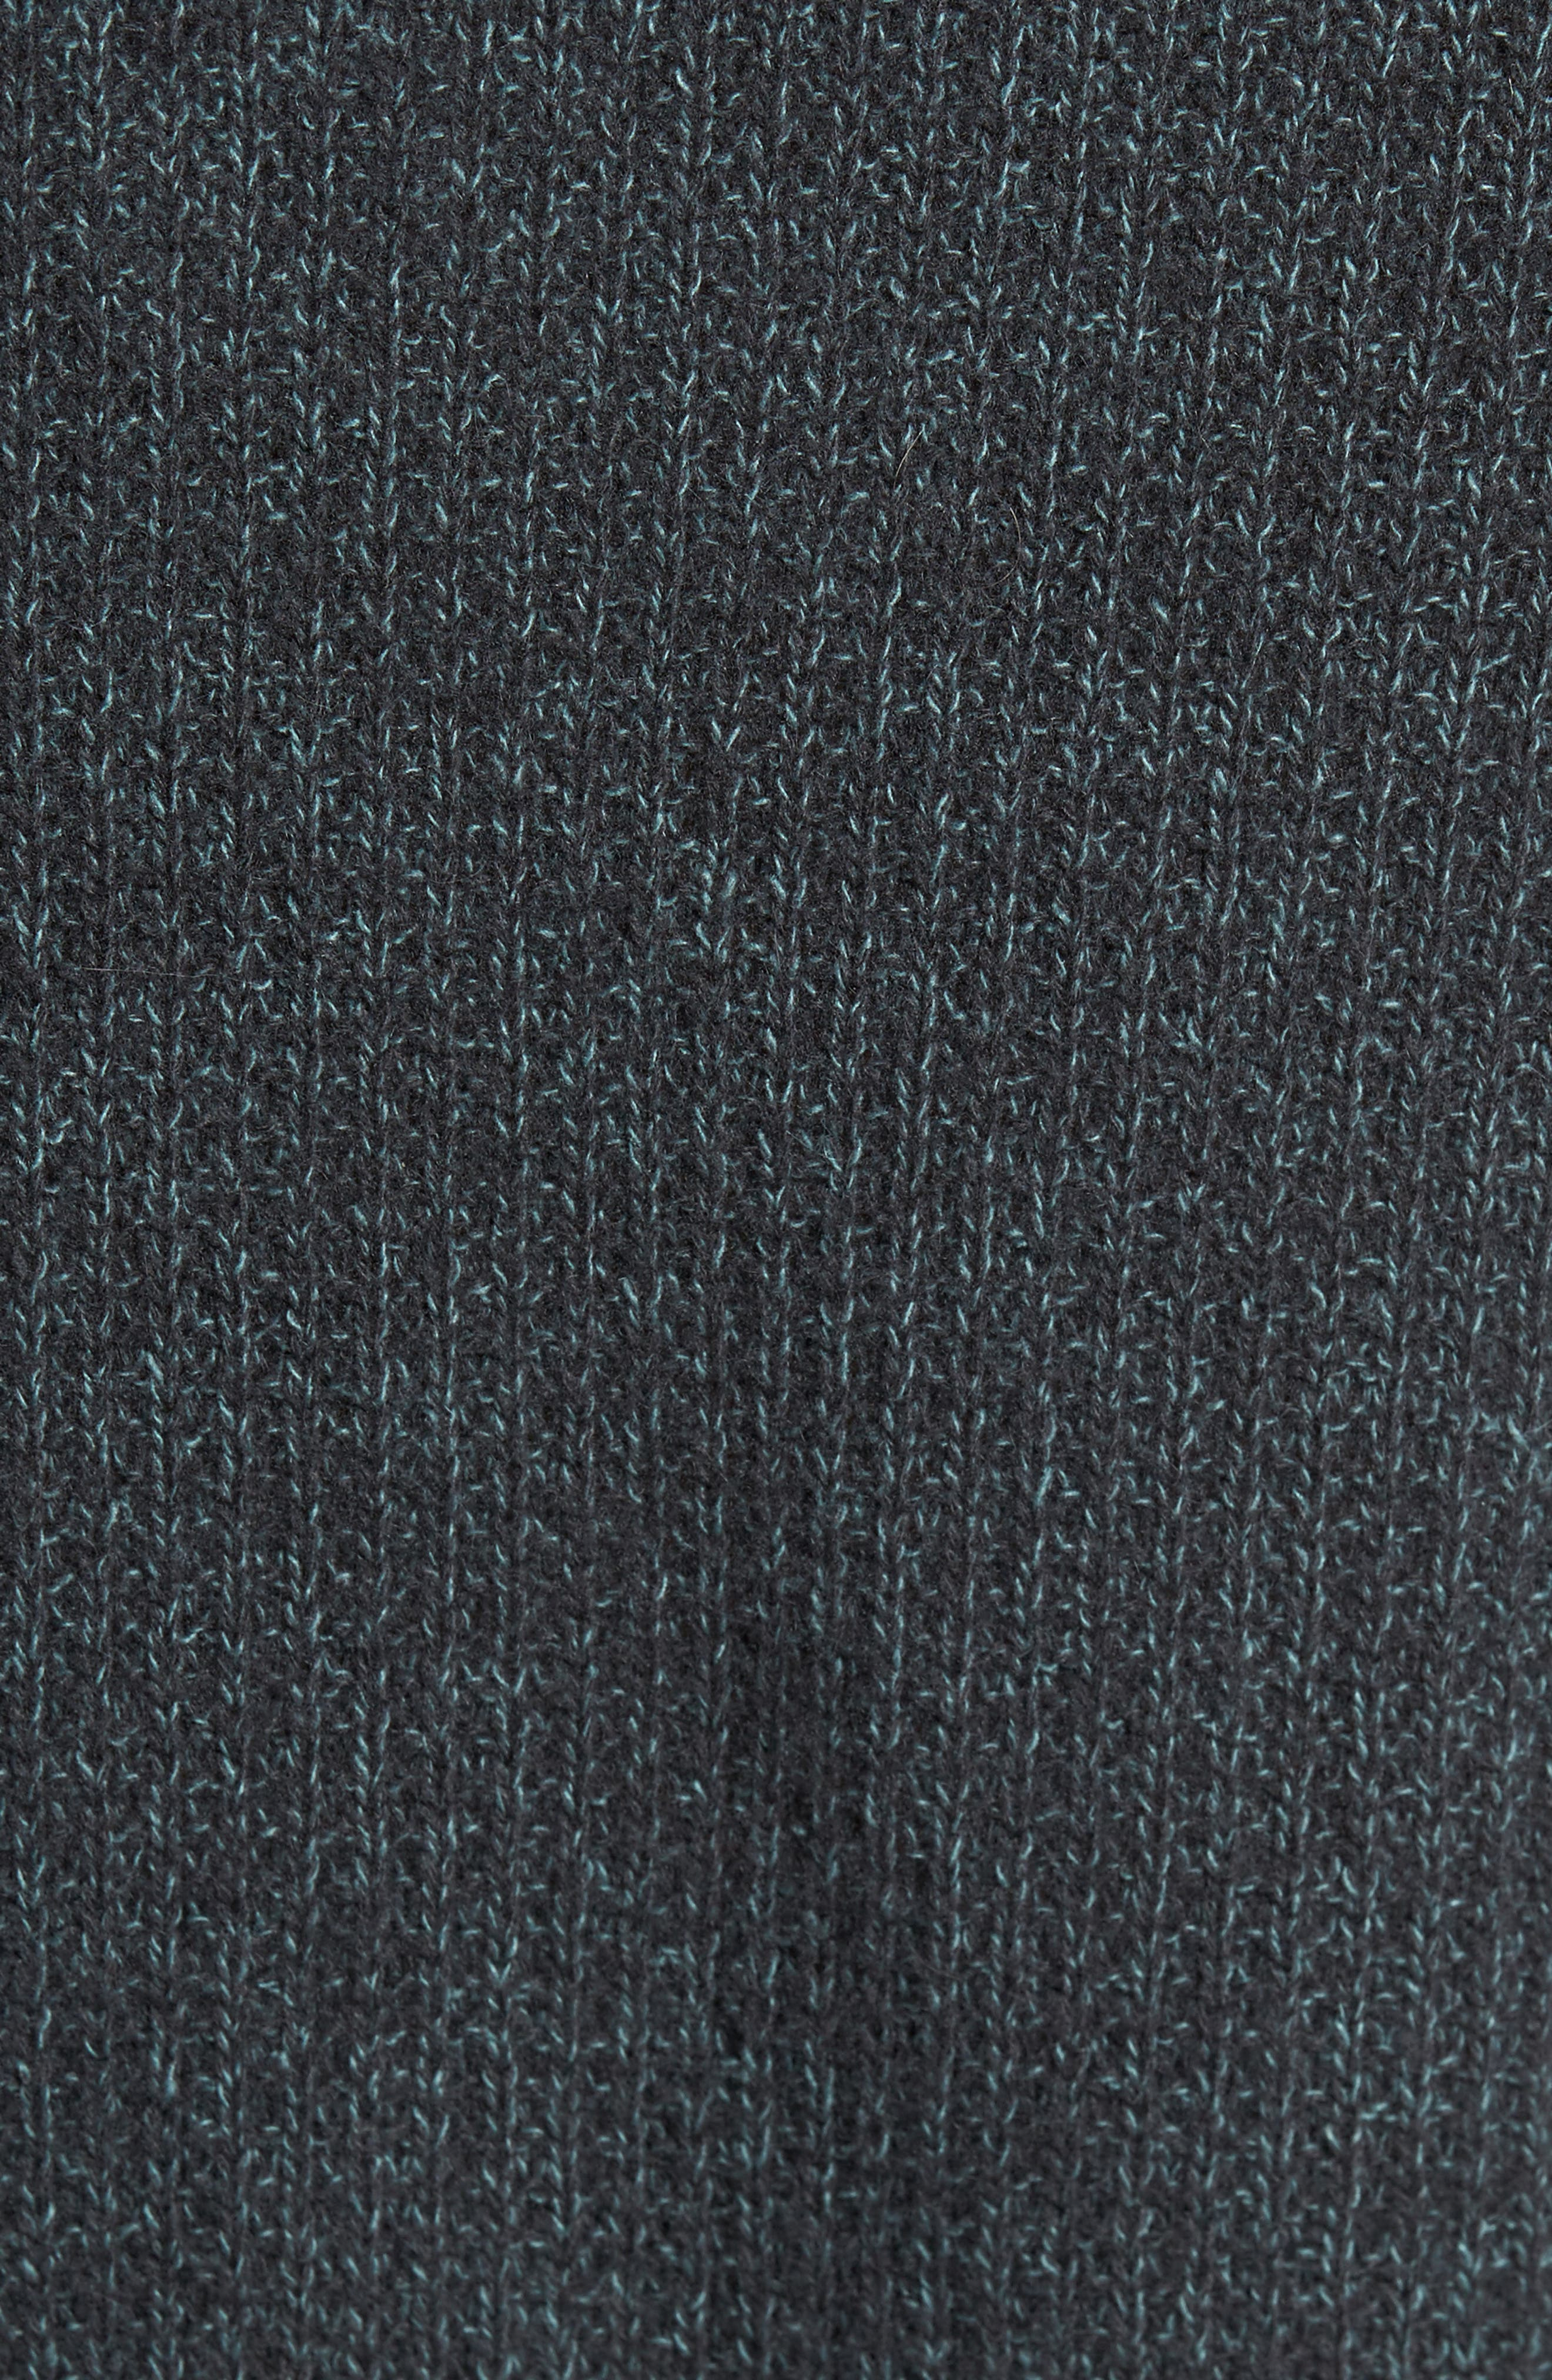 Thermal Knit Crewneck Cashmere Sweater,                             Alternate thumbnail 5, color,                             Beetle/ Mint